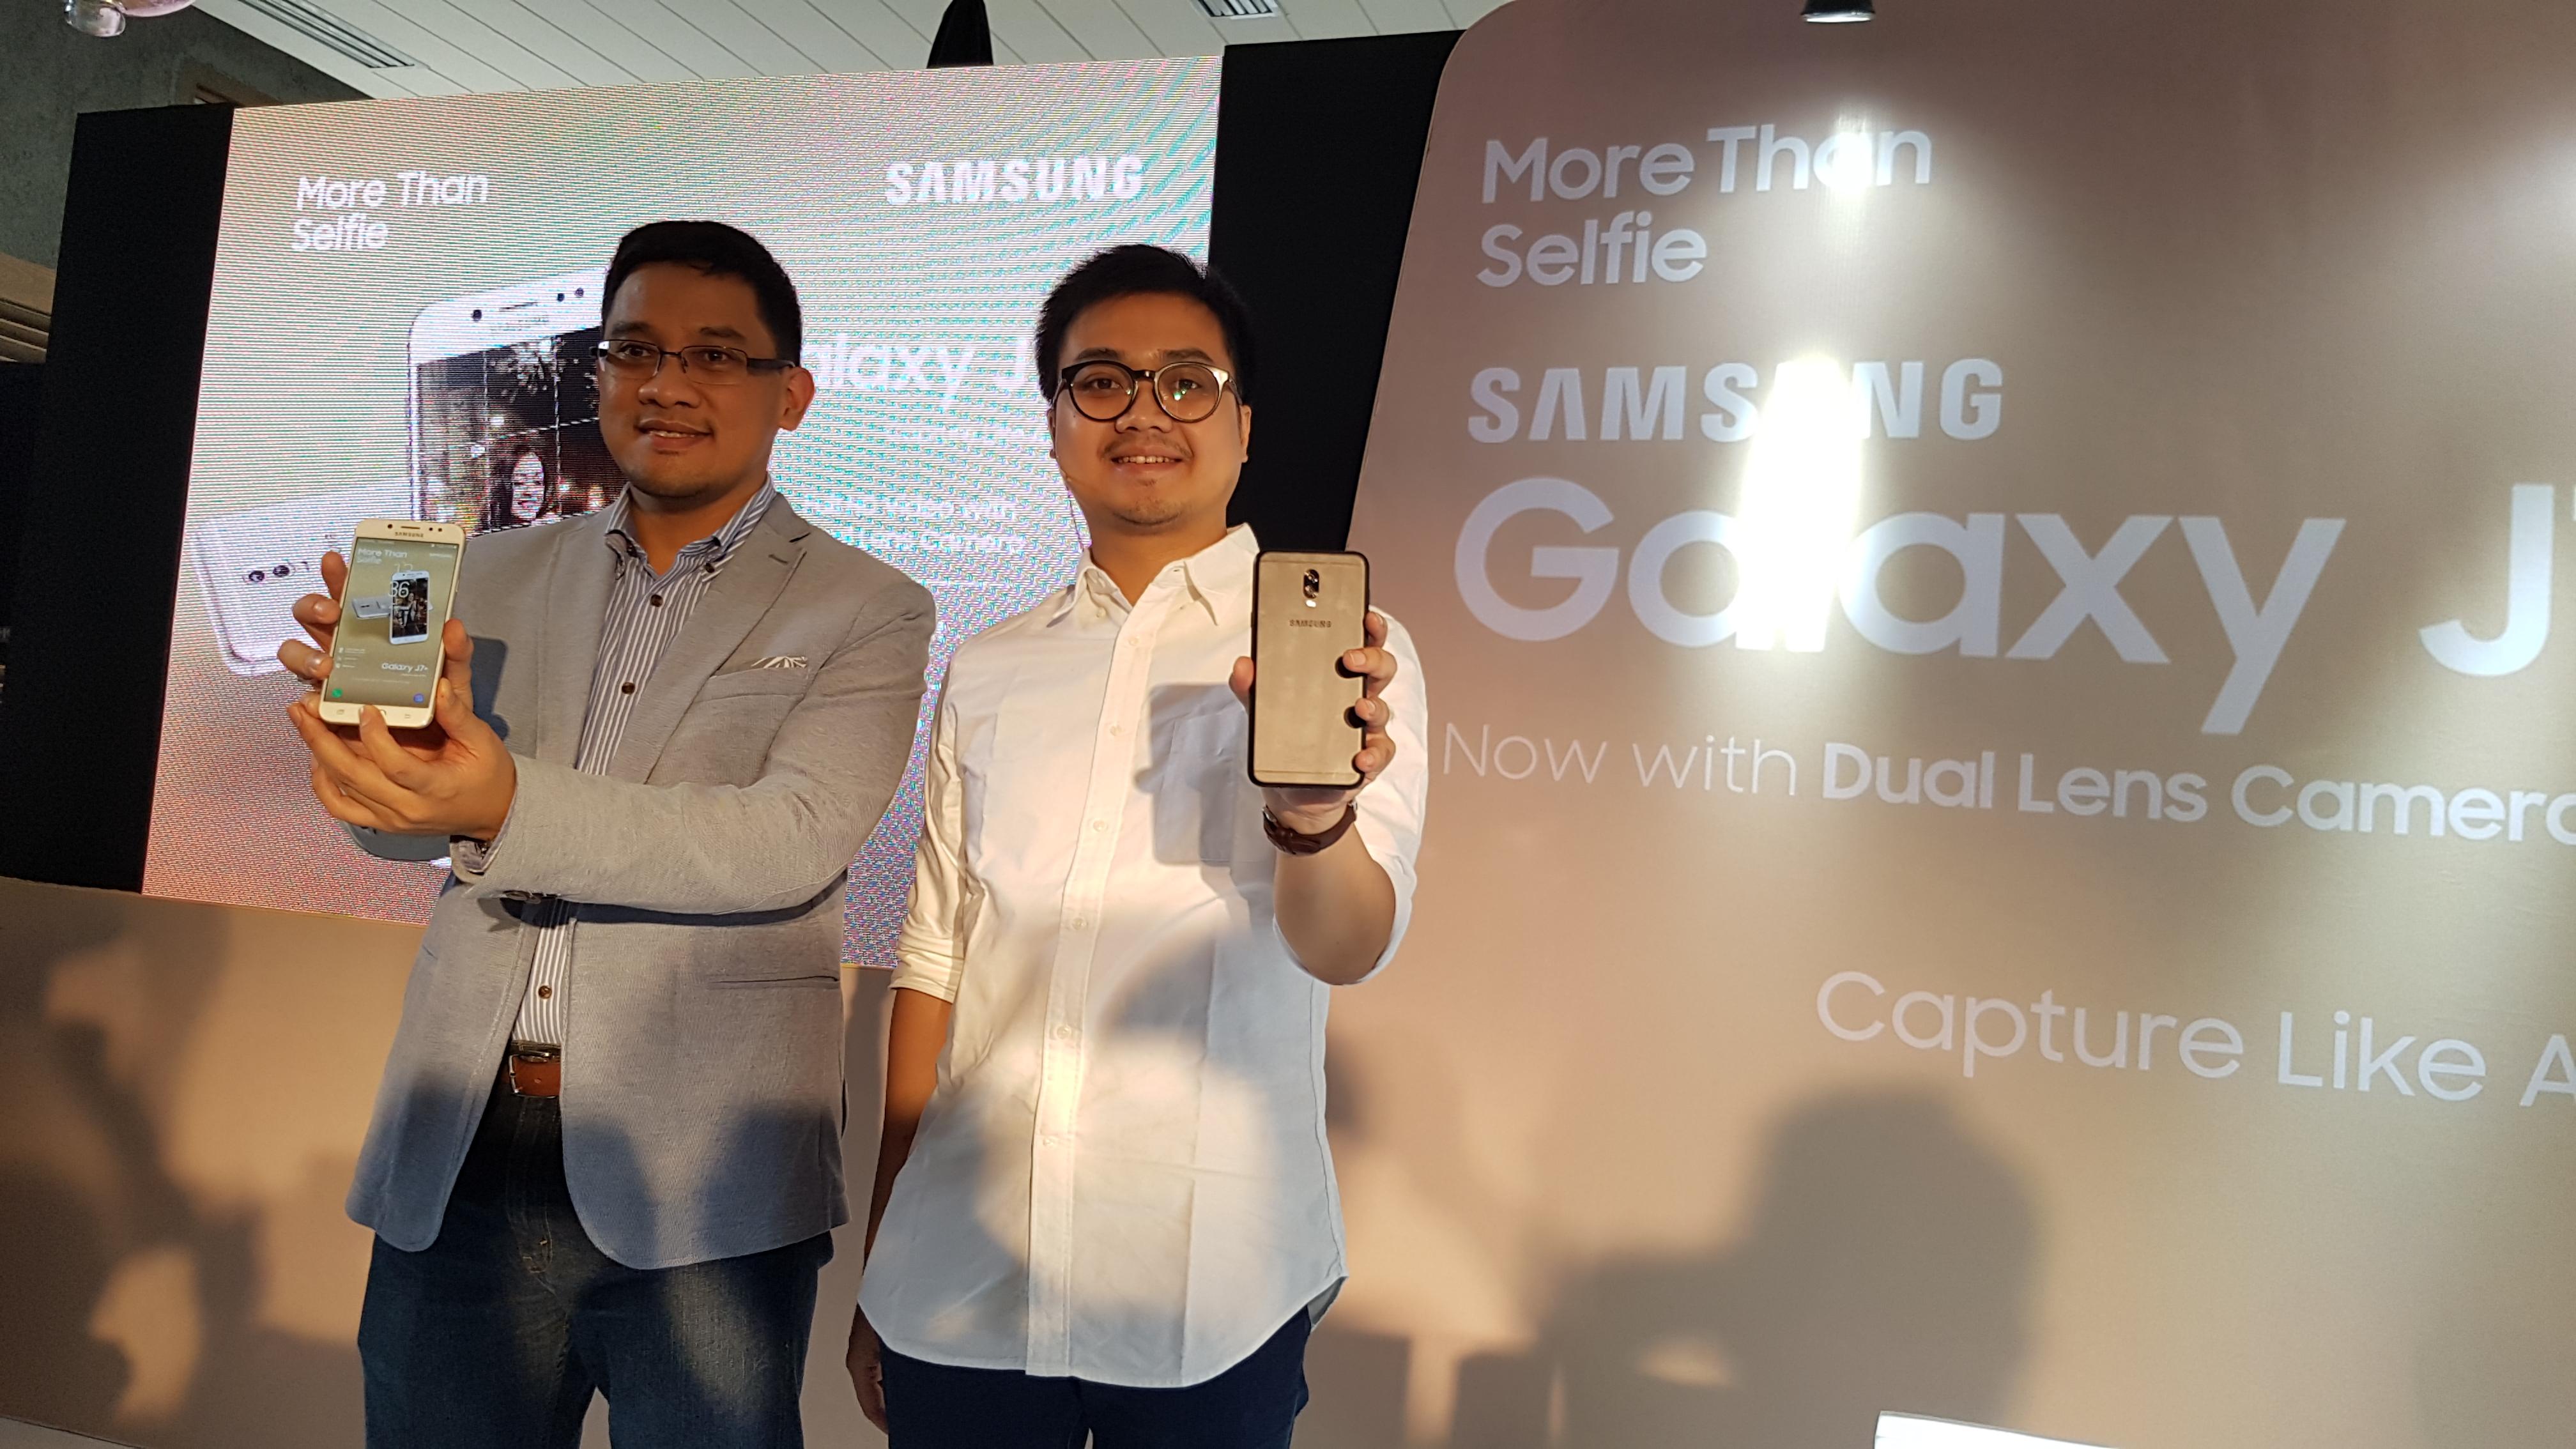 Head of Product Marketing, IT, & Mobile Samsung Indonesia, Denny Galant dan Product Marketing Samsung Mobile, Irfan Rinaldy (Maulia Salamuddin/Telset.id)